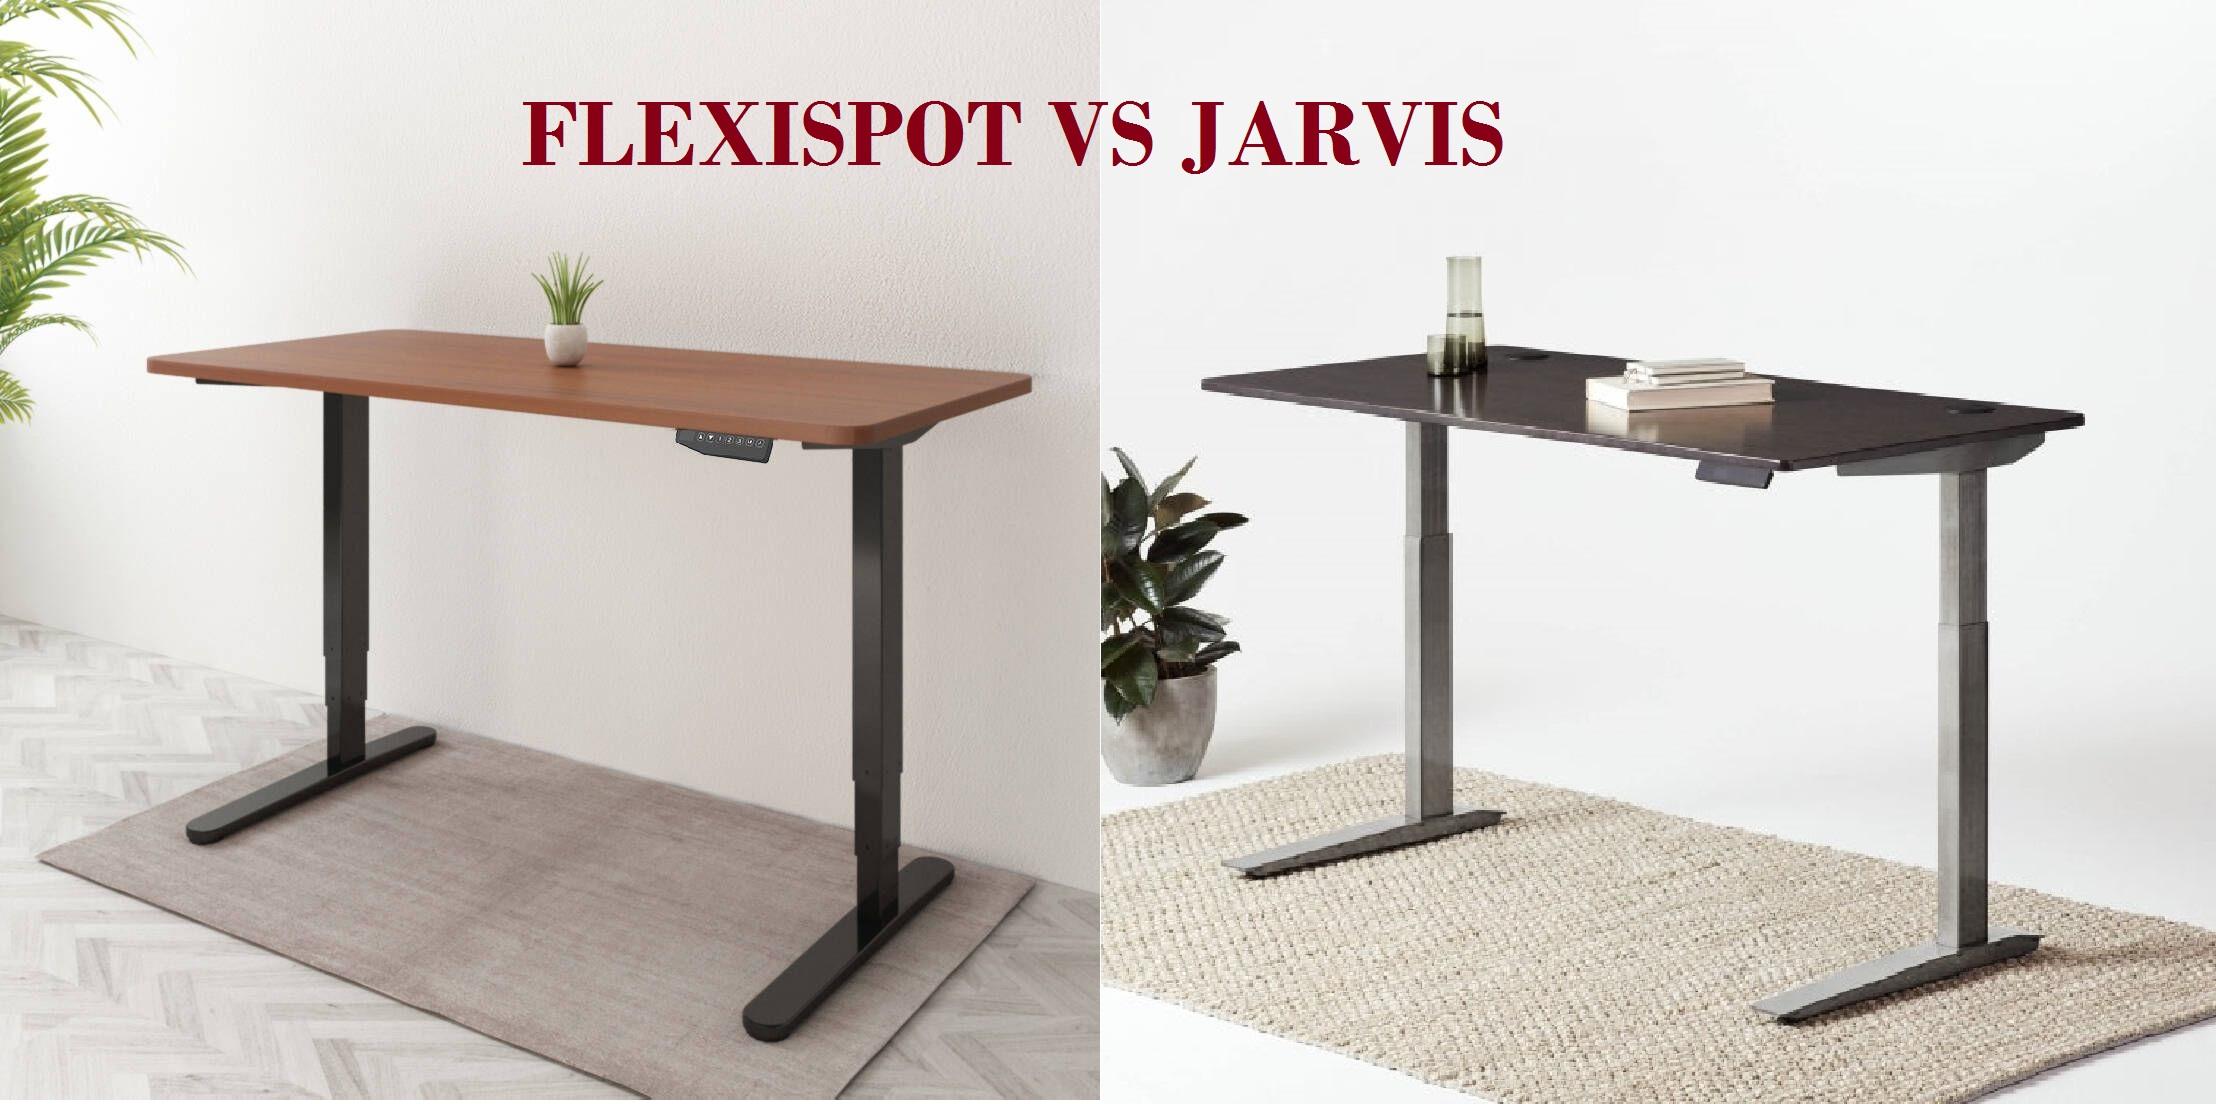 flexispot vs jarvis